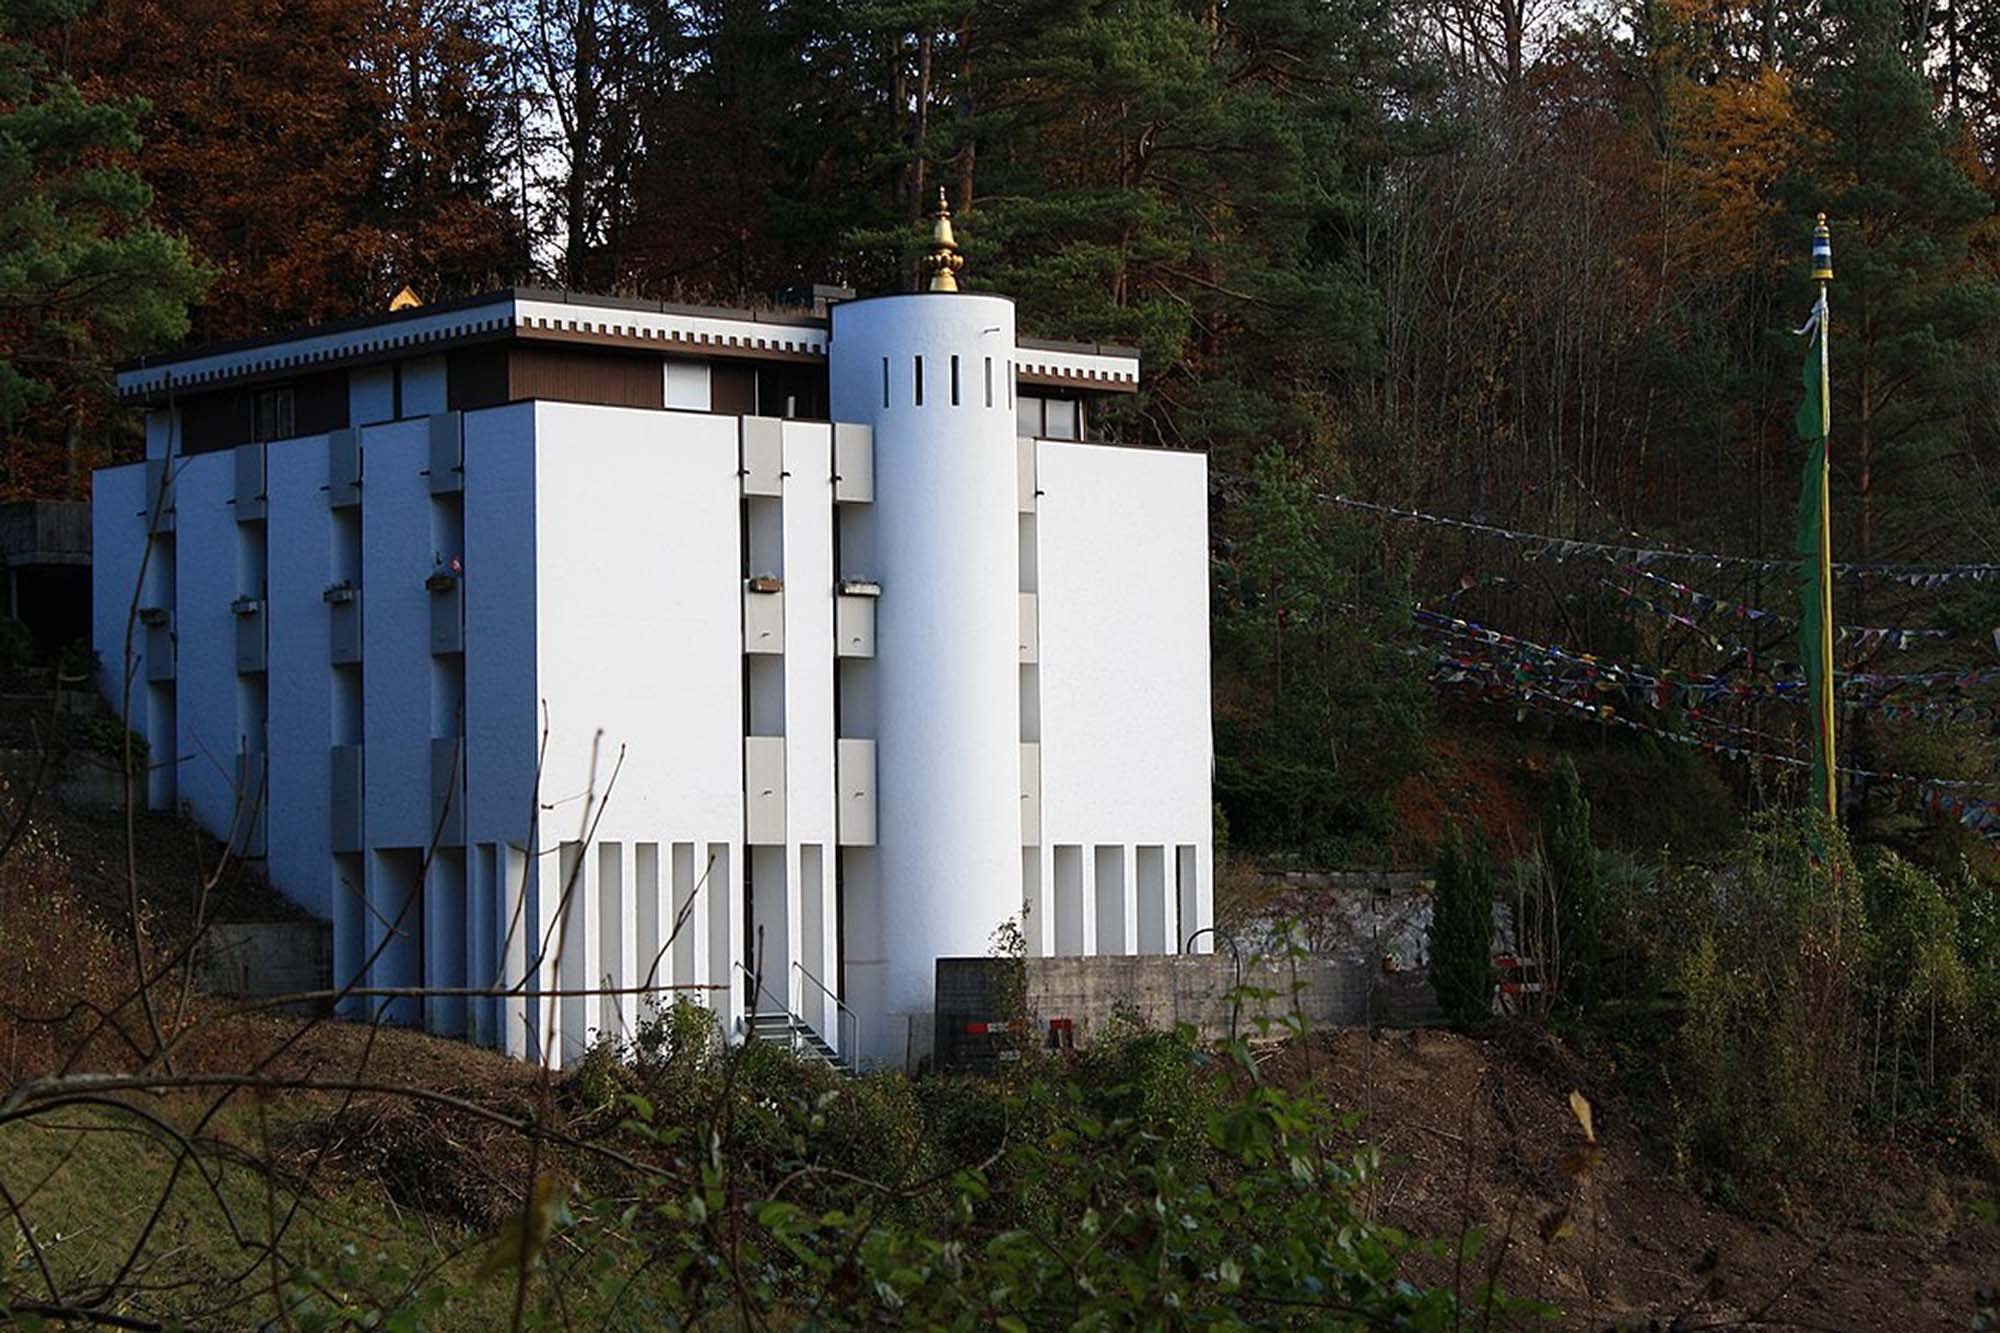 Tibet Institute Rikon, Rikon, Switzerland